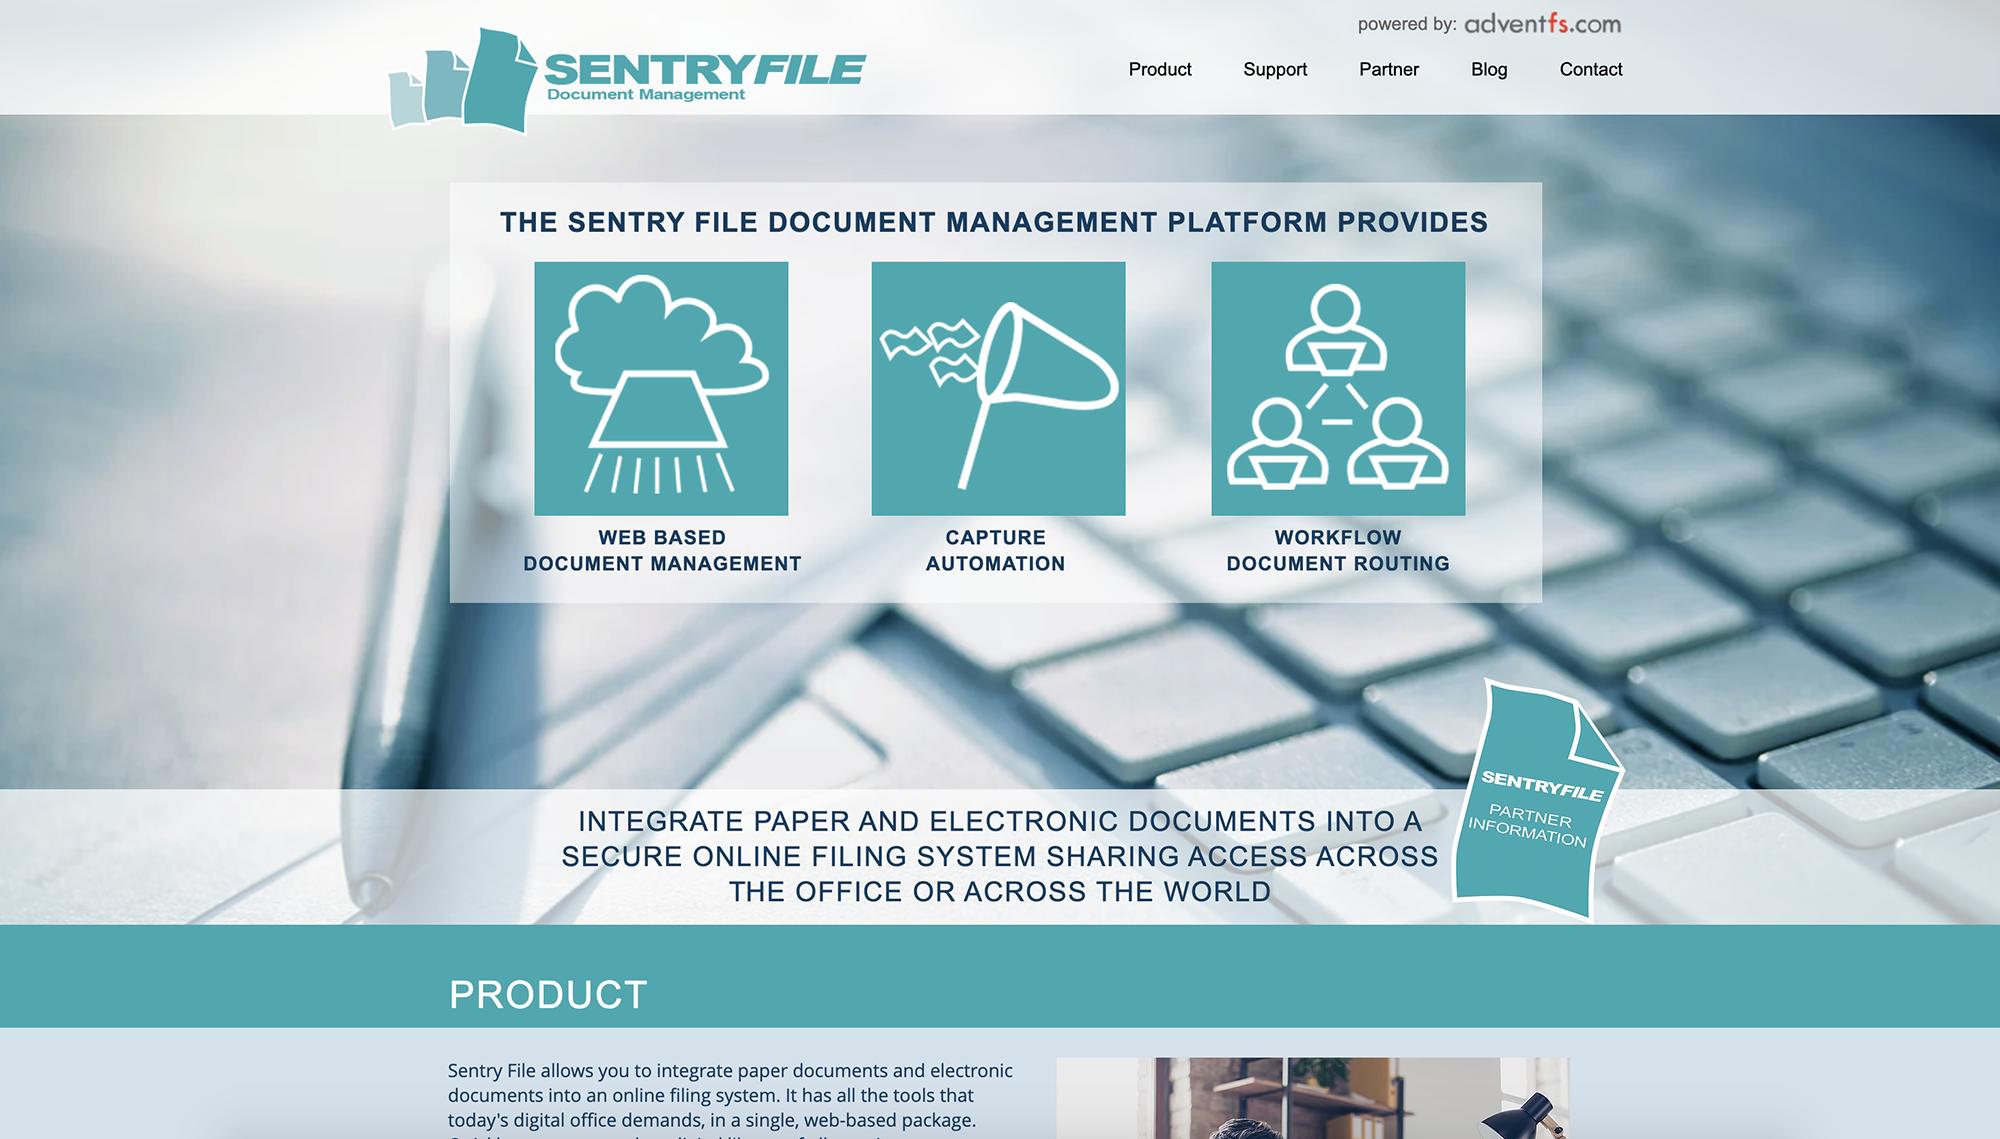 Sentry File